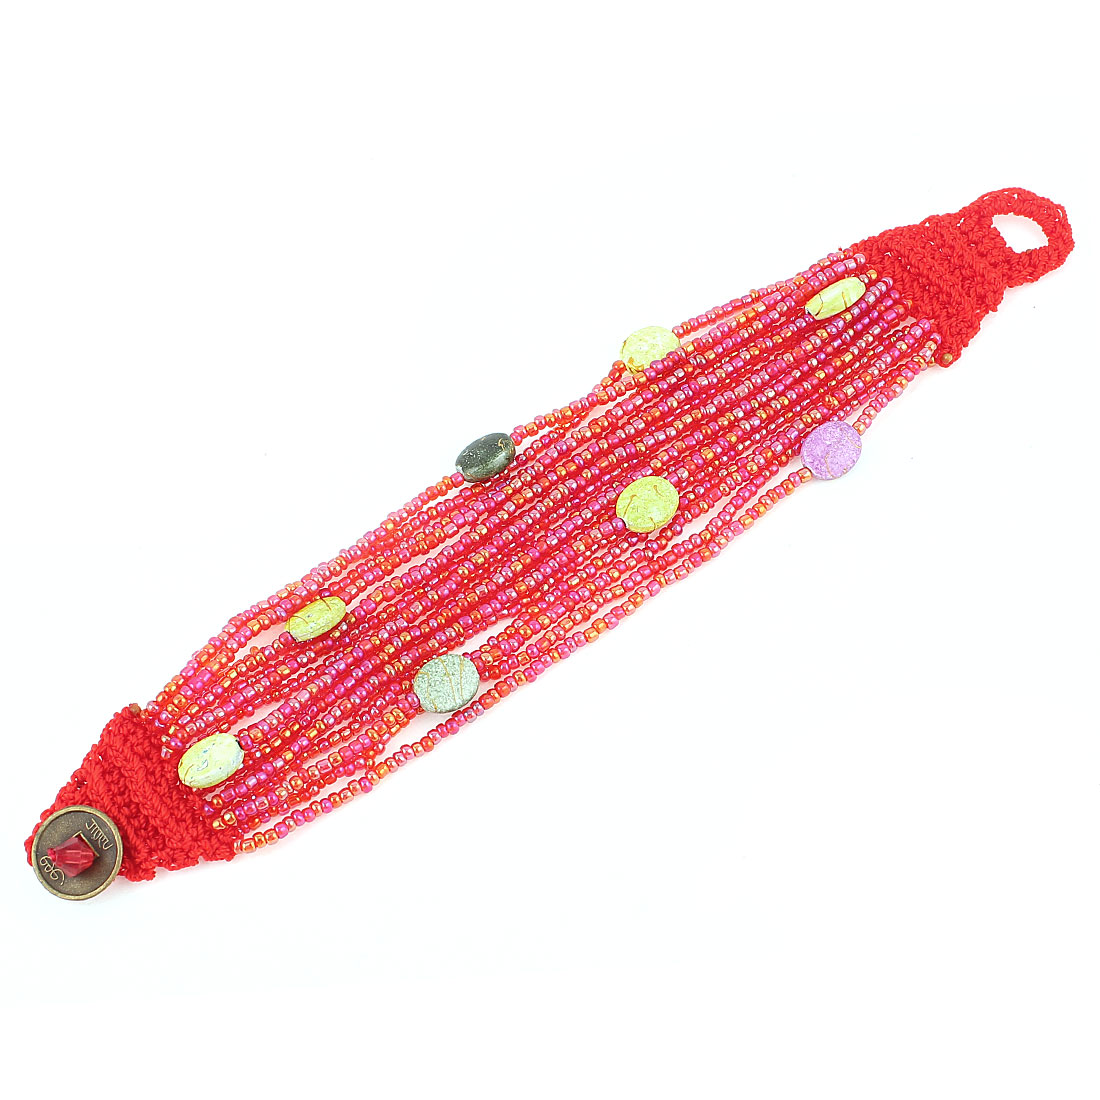 "Knitting Detailing Button Closure Multilayer Beaded Bracelet Bangle Red 18cm 7"" for Women"